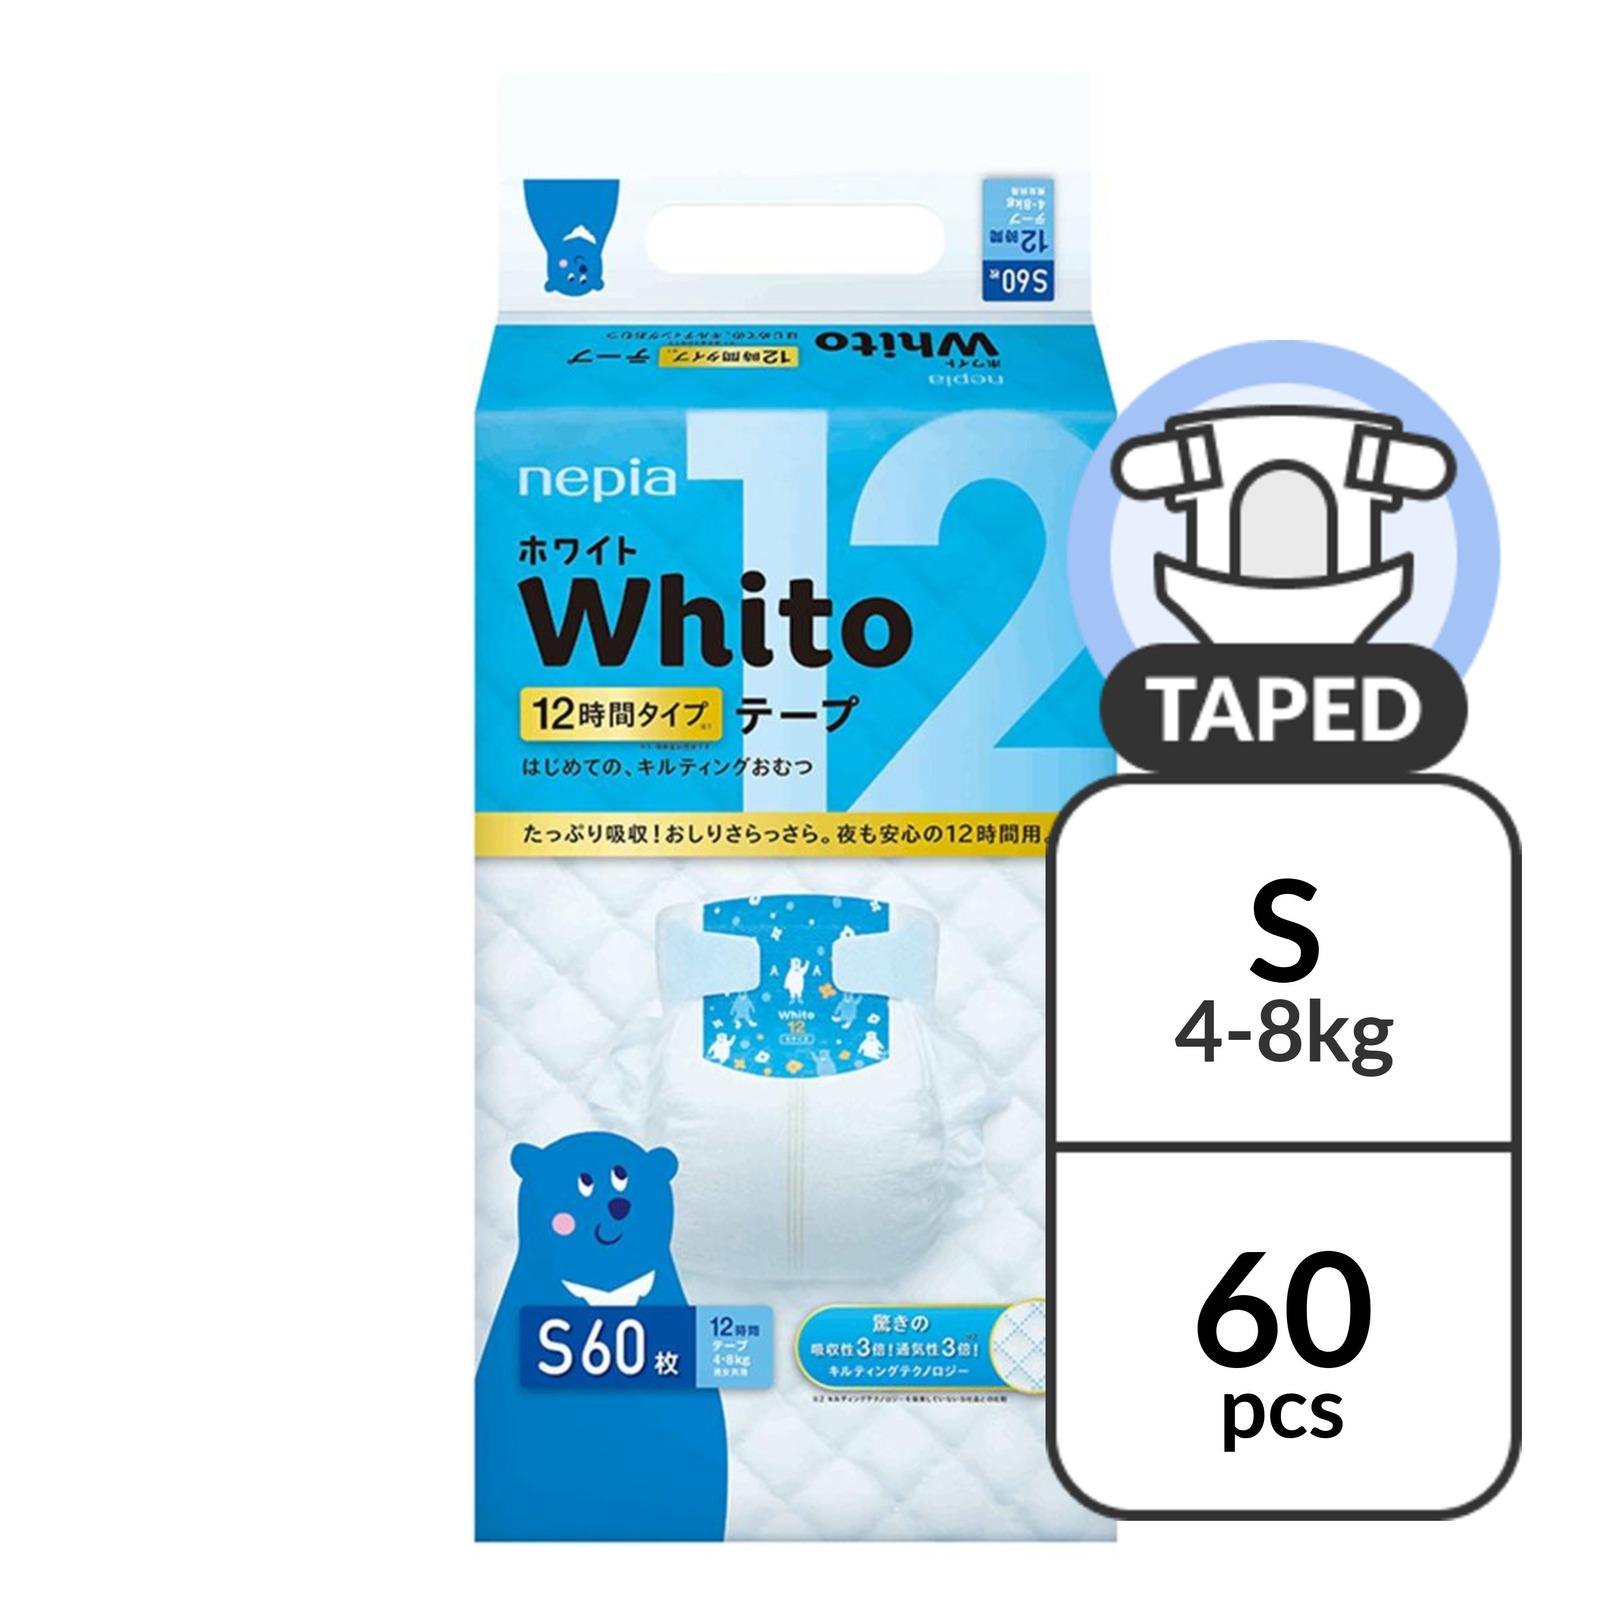 NEPIA Whito Tape S 12H - (4-8kg) 60 pc